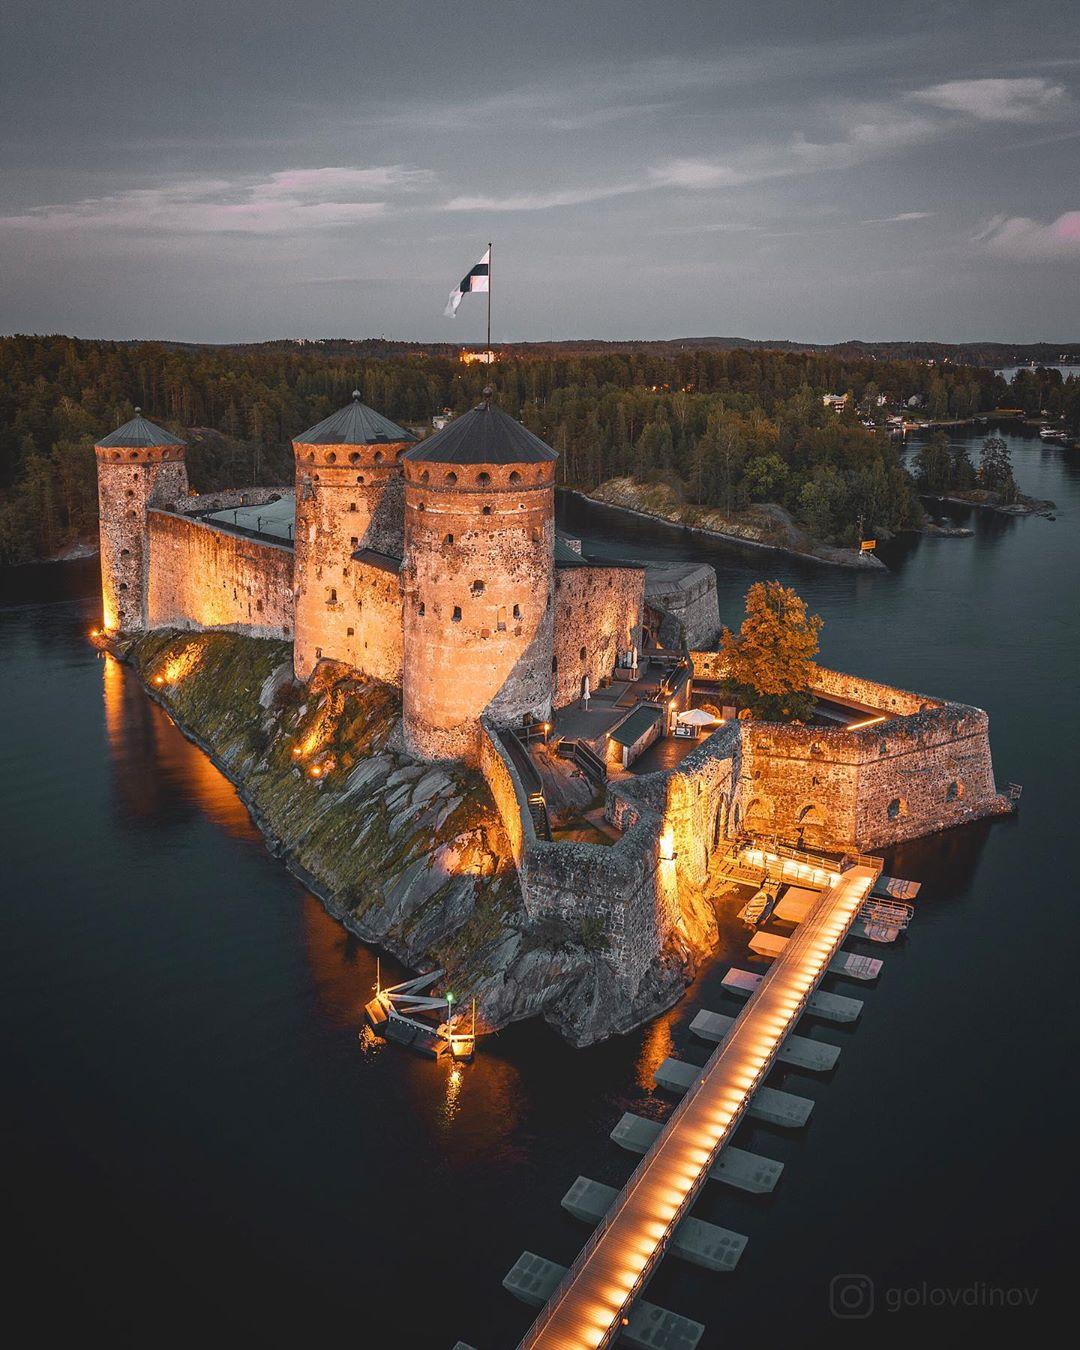 Lâu đài Olavinlinna, hồ Savonlinna, Phần Lan